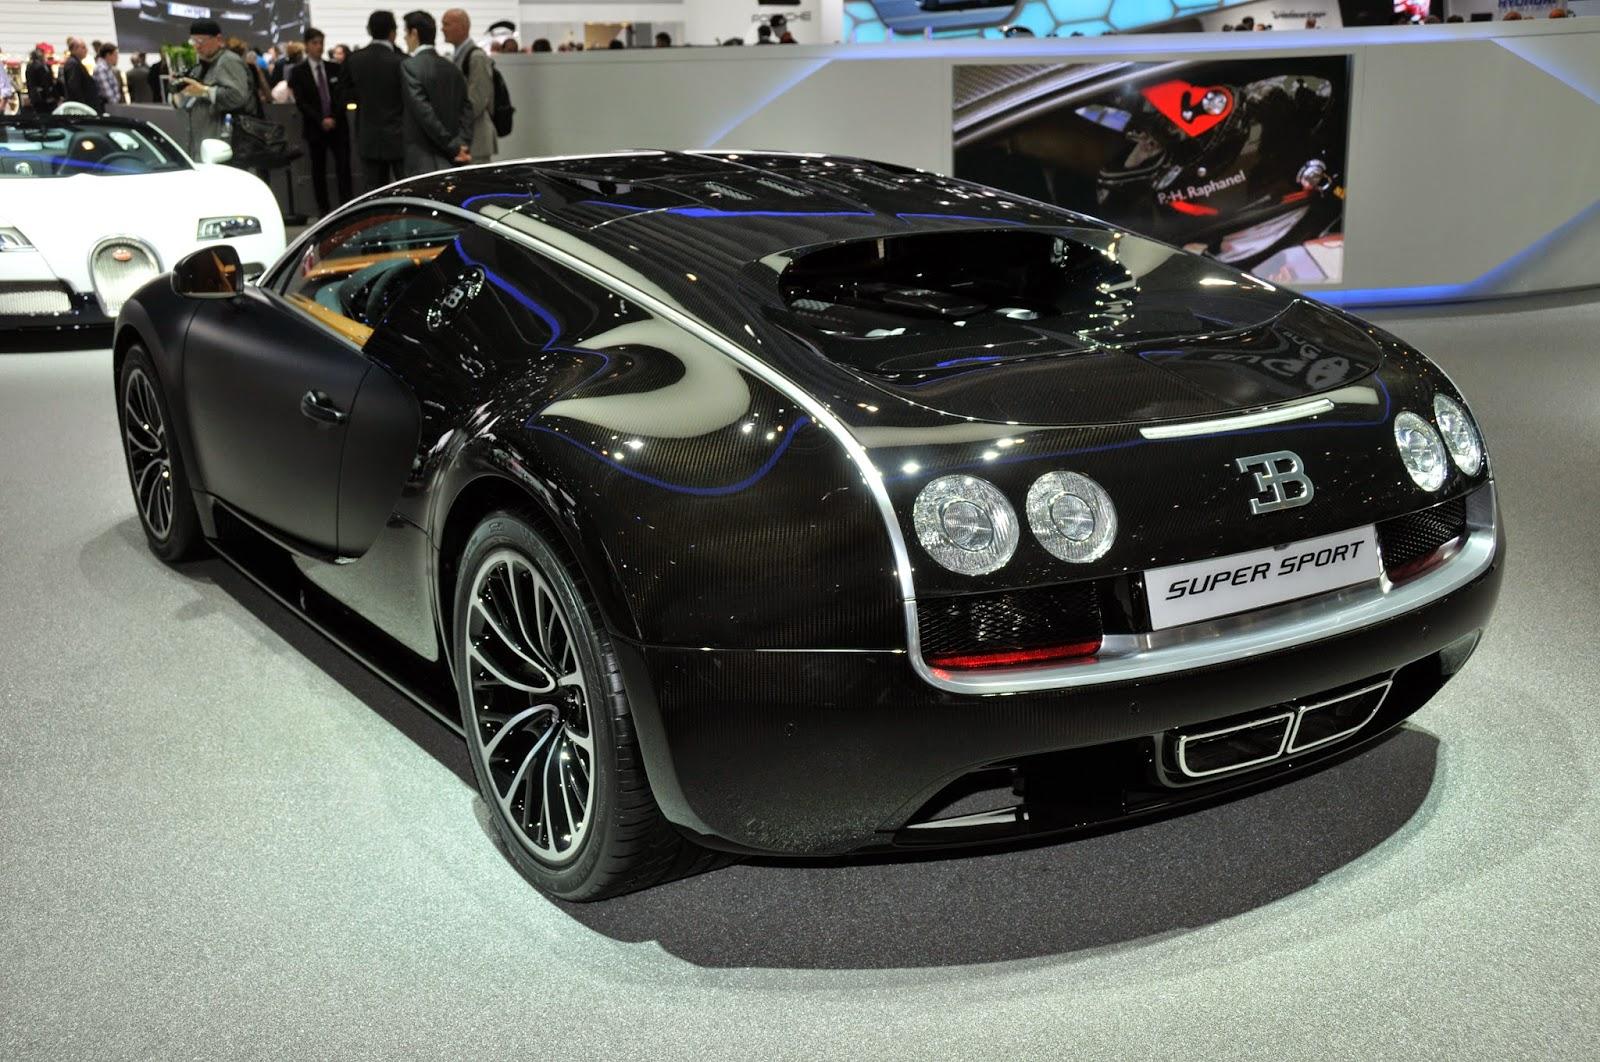 Bugatti Super Veyron Back View Image